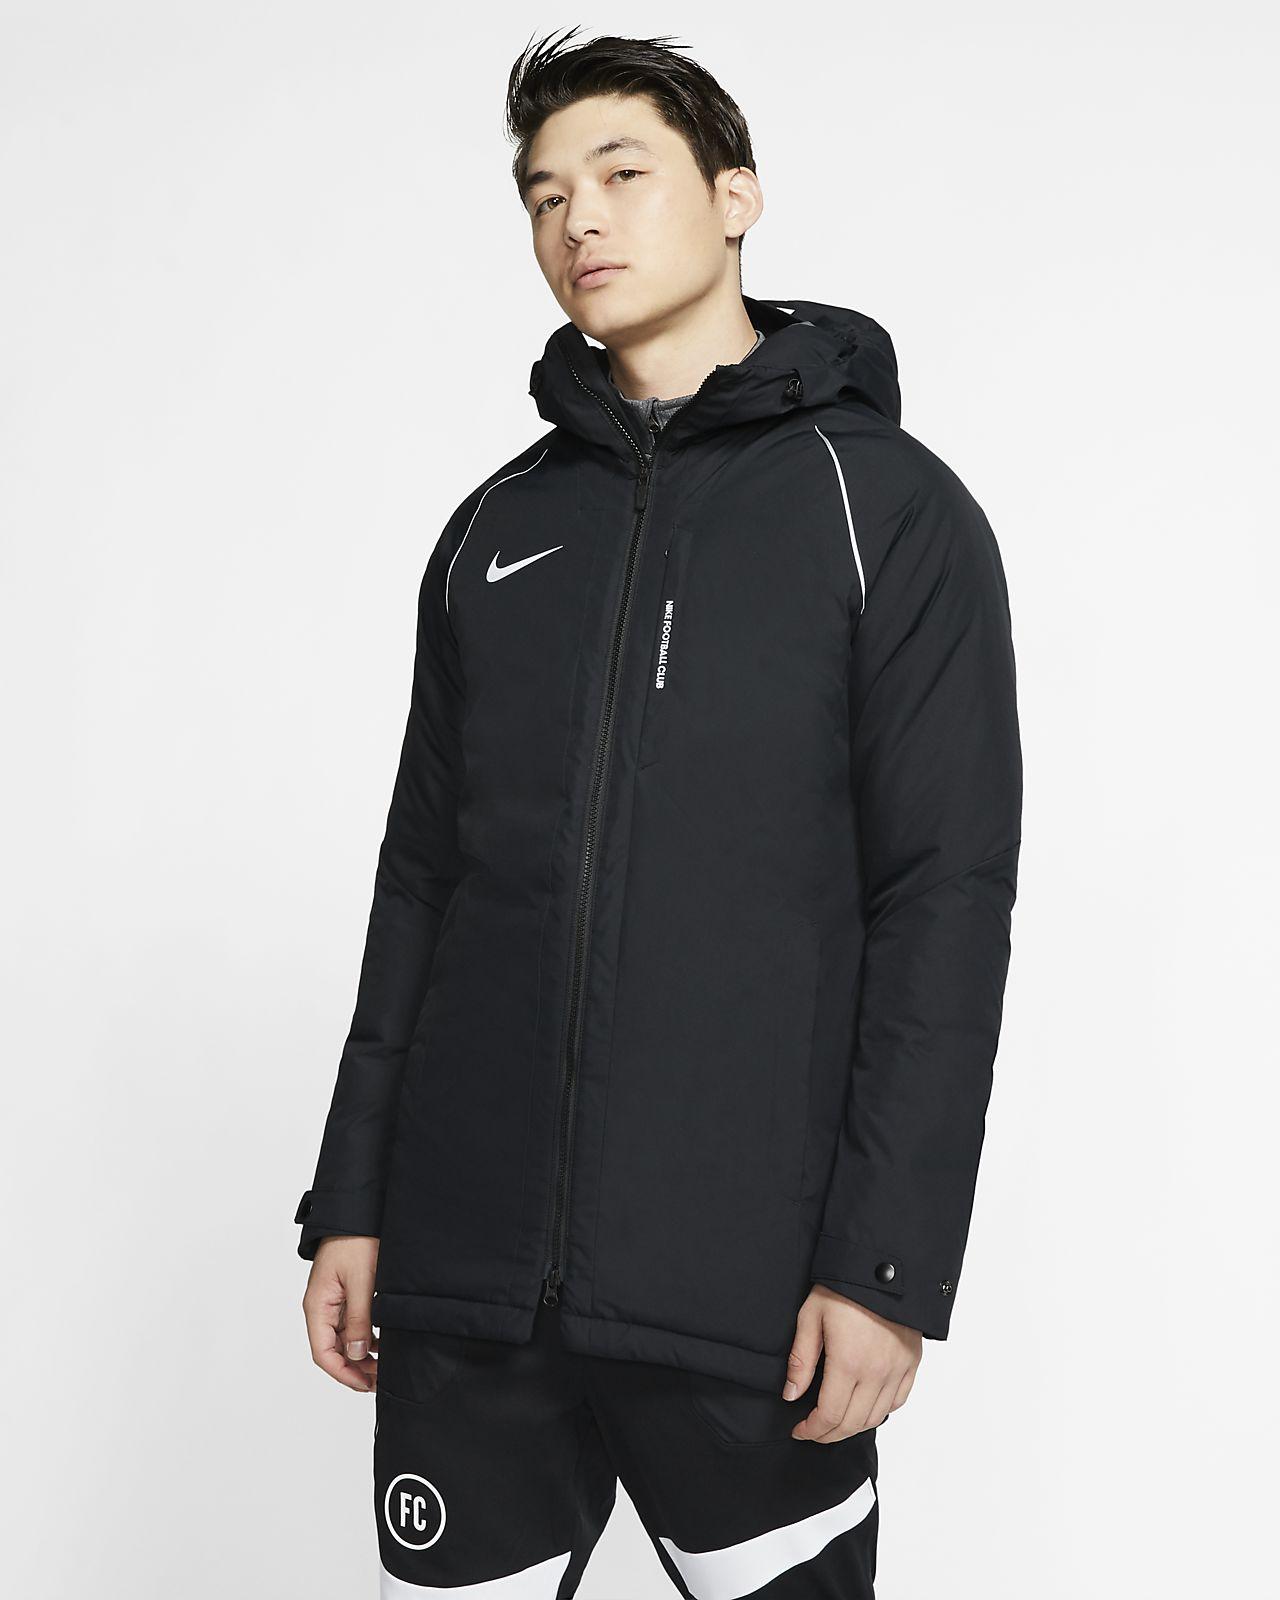 Chamarra para hombre Nike F.C. Sideline